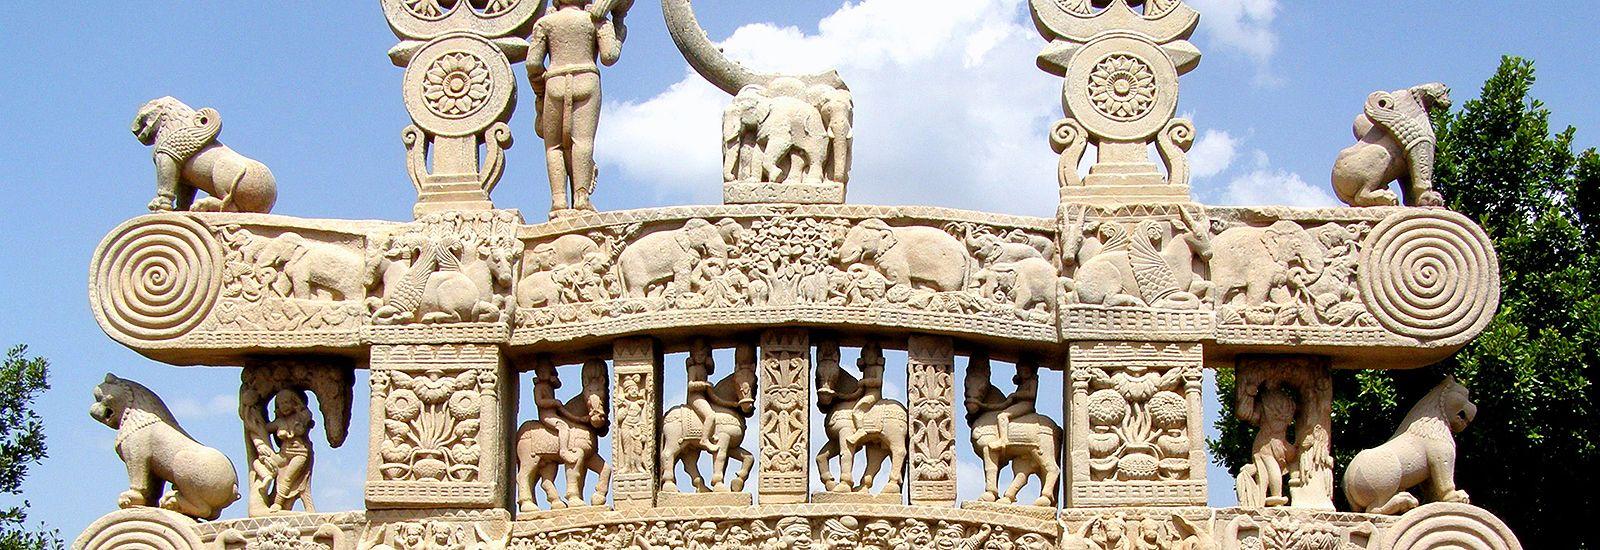 Rock statues at the Great Stupa at Sanchi